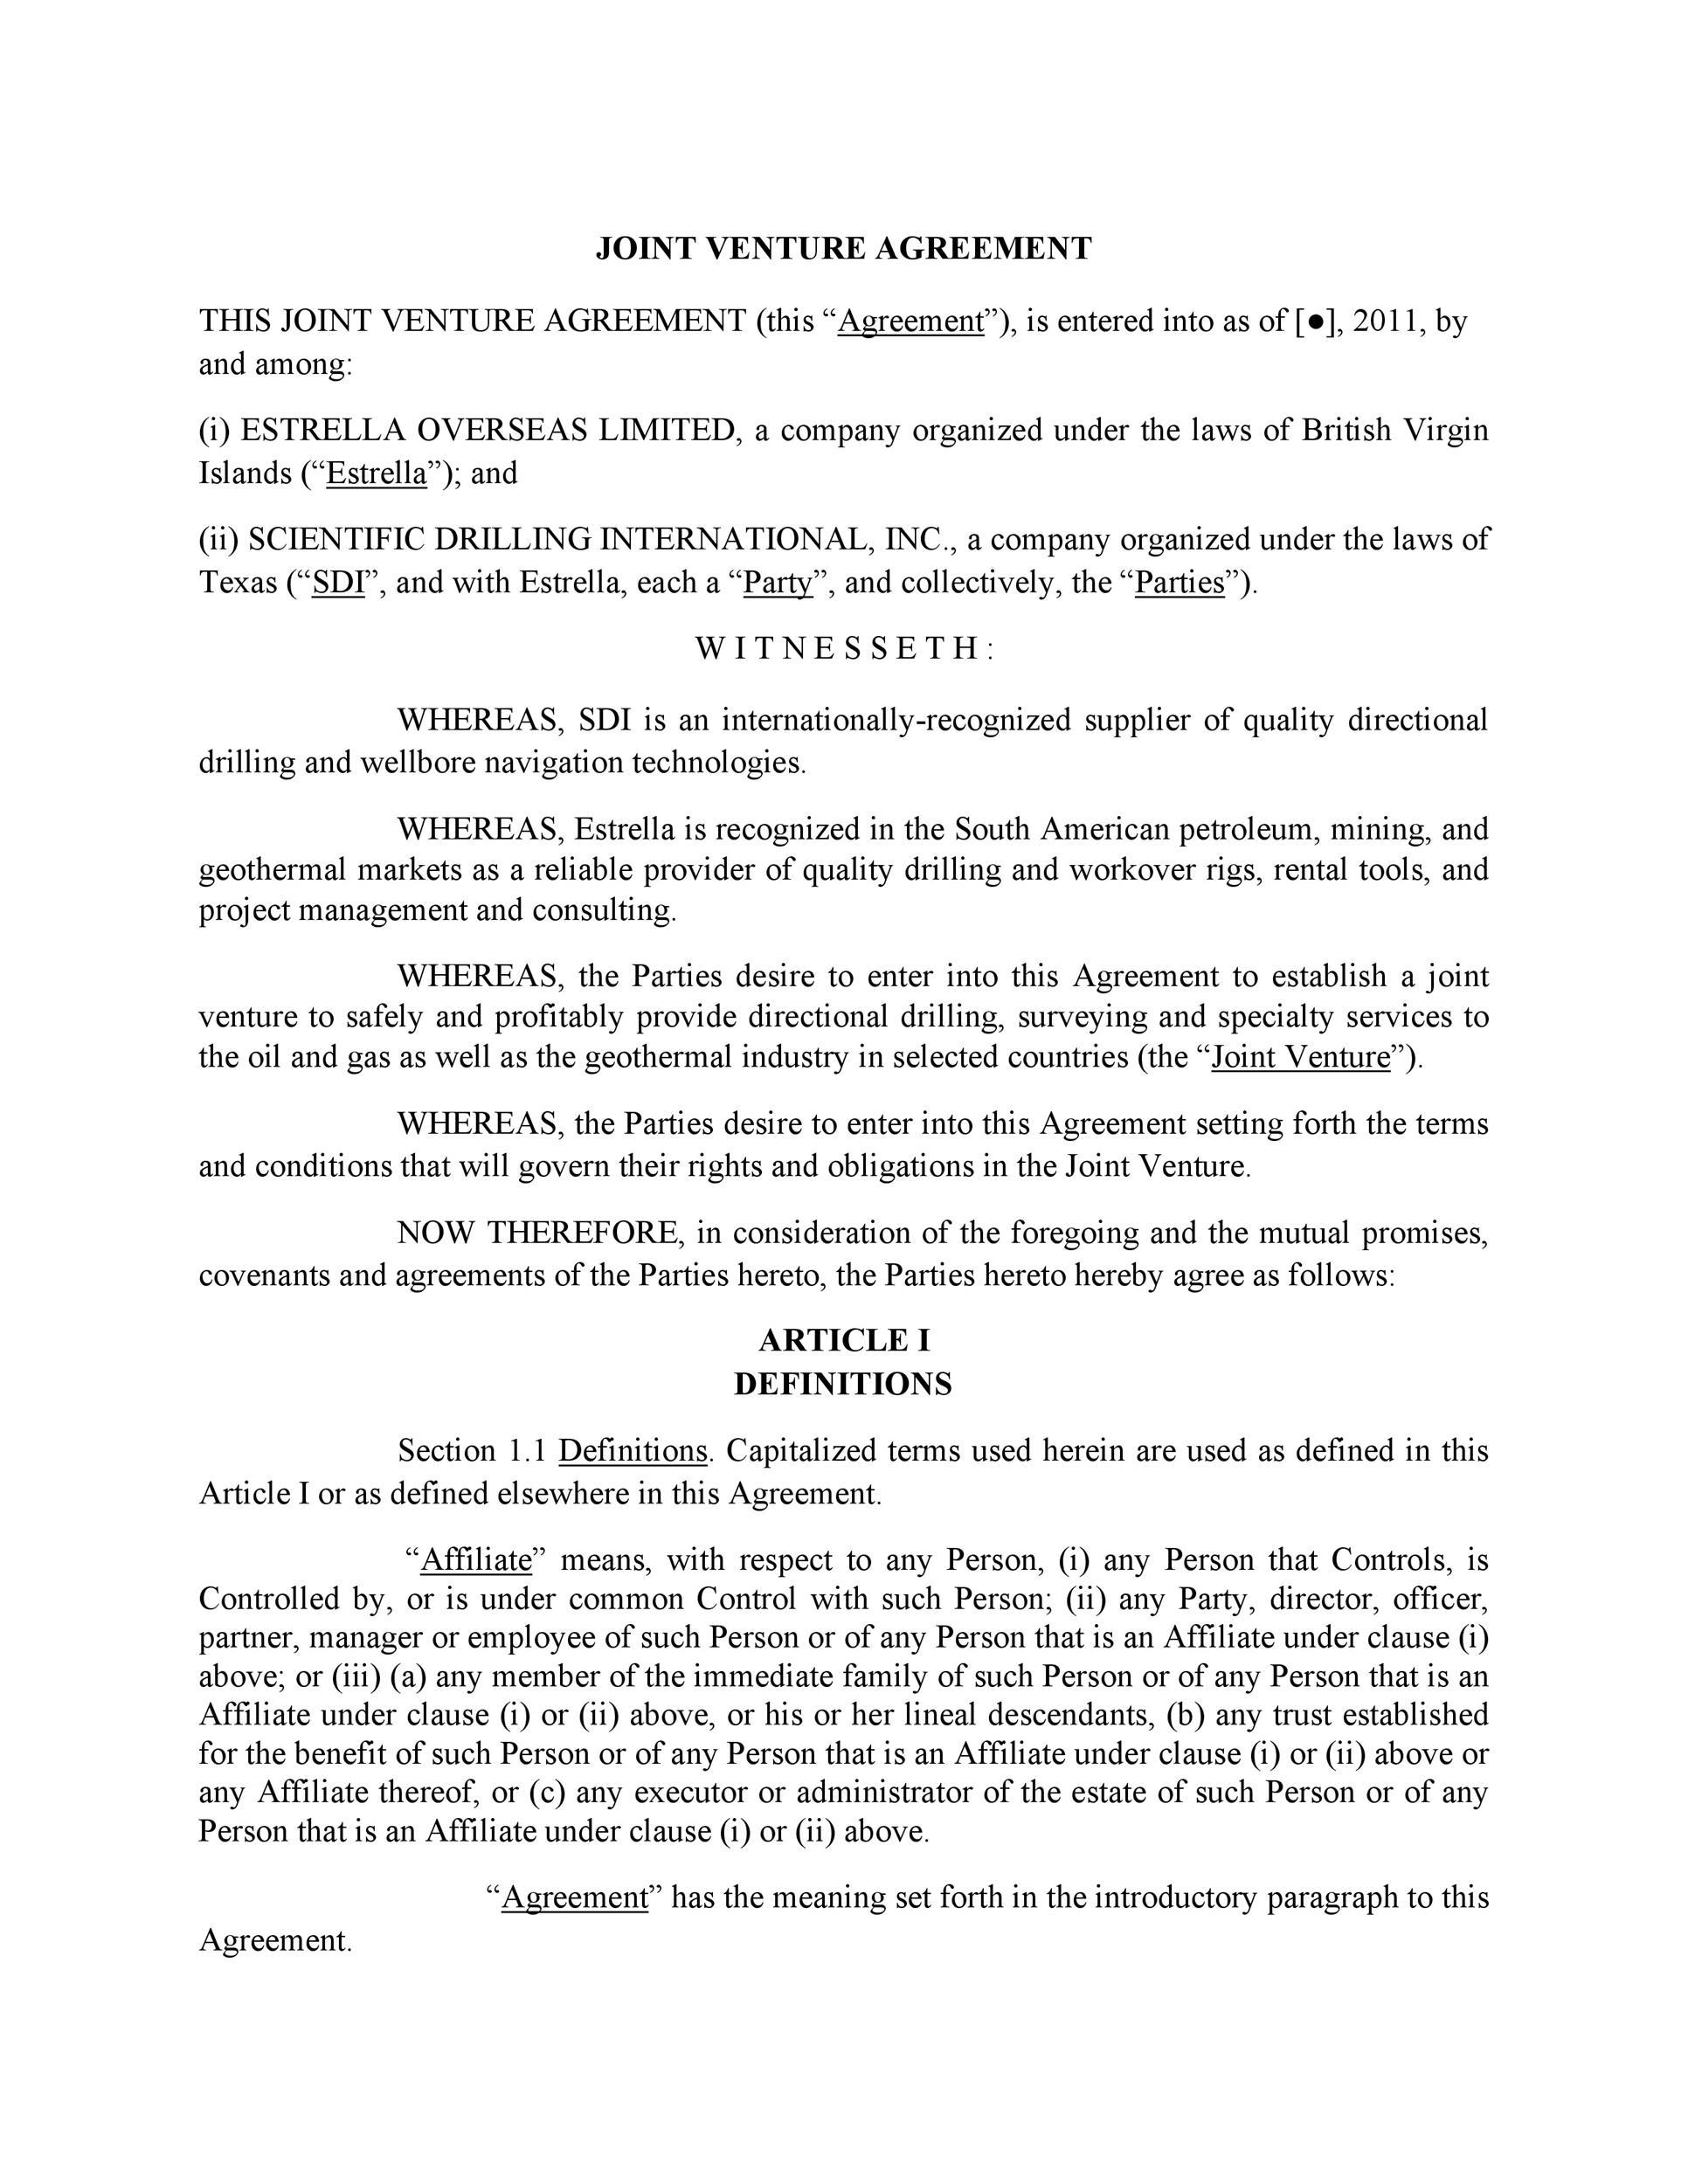 53 Simple Joint Venture Agreement Templates PDF, DOC - Template Lab - joint venture agreement sample word format